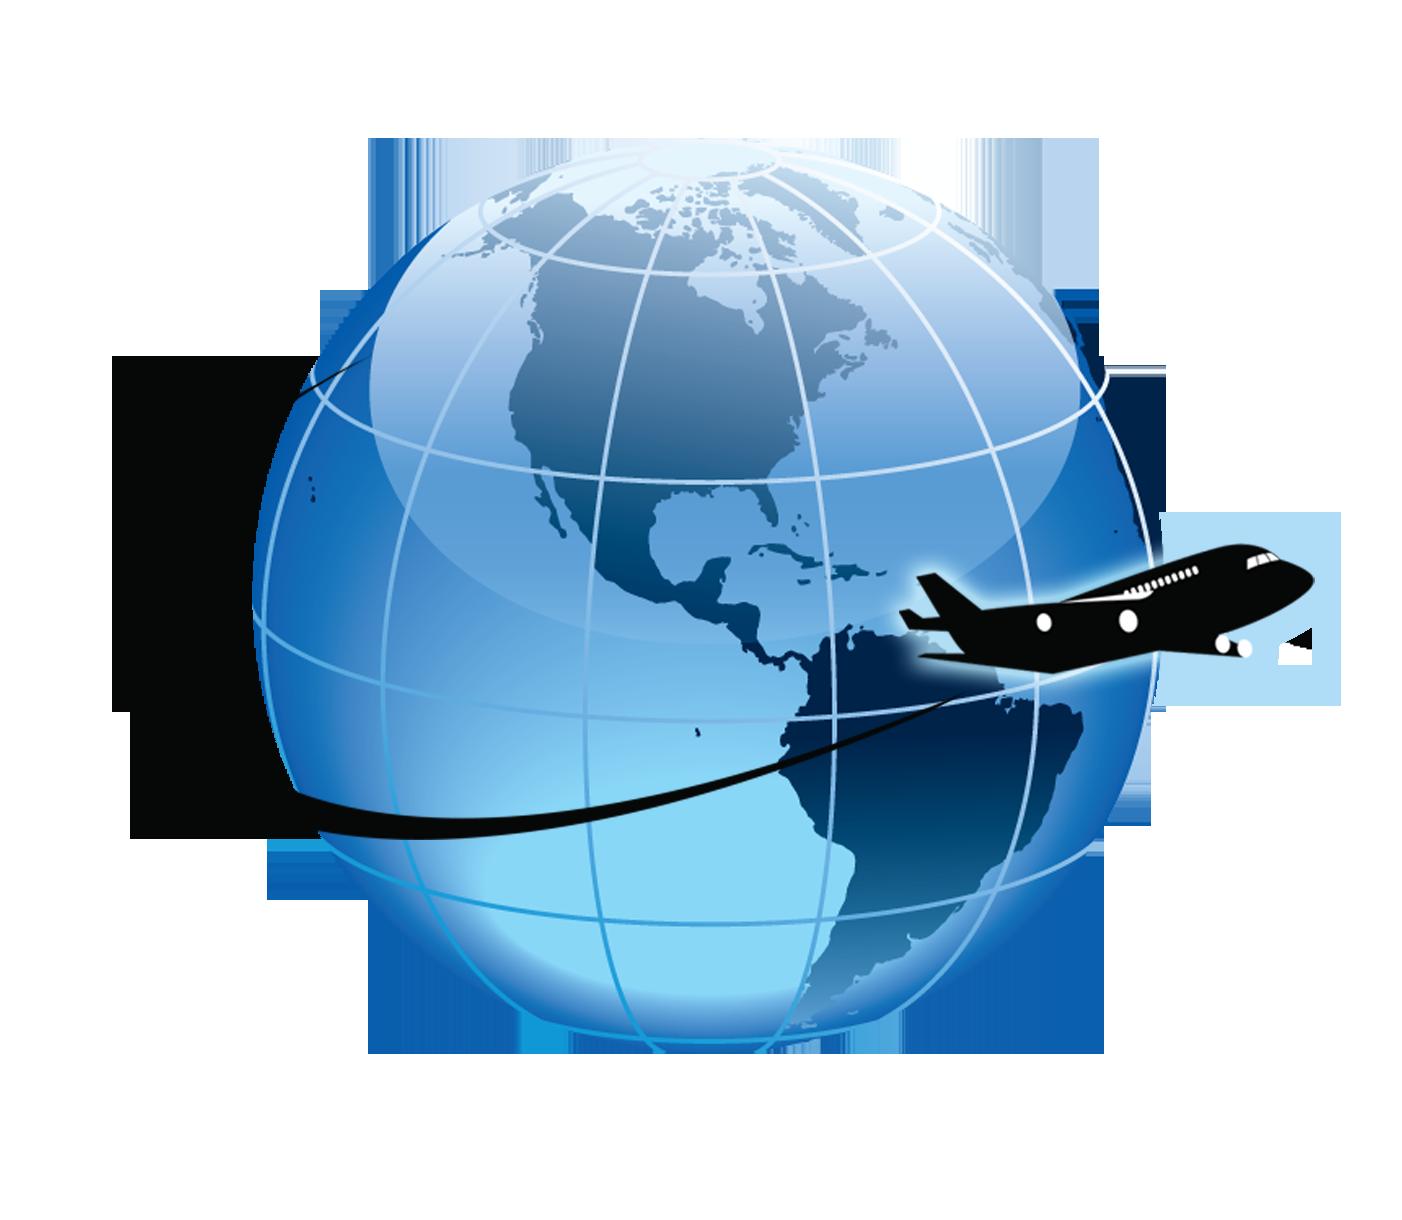 Globe clipart airplane, Globe airplane Transparent FREE for.